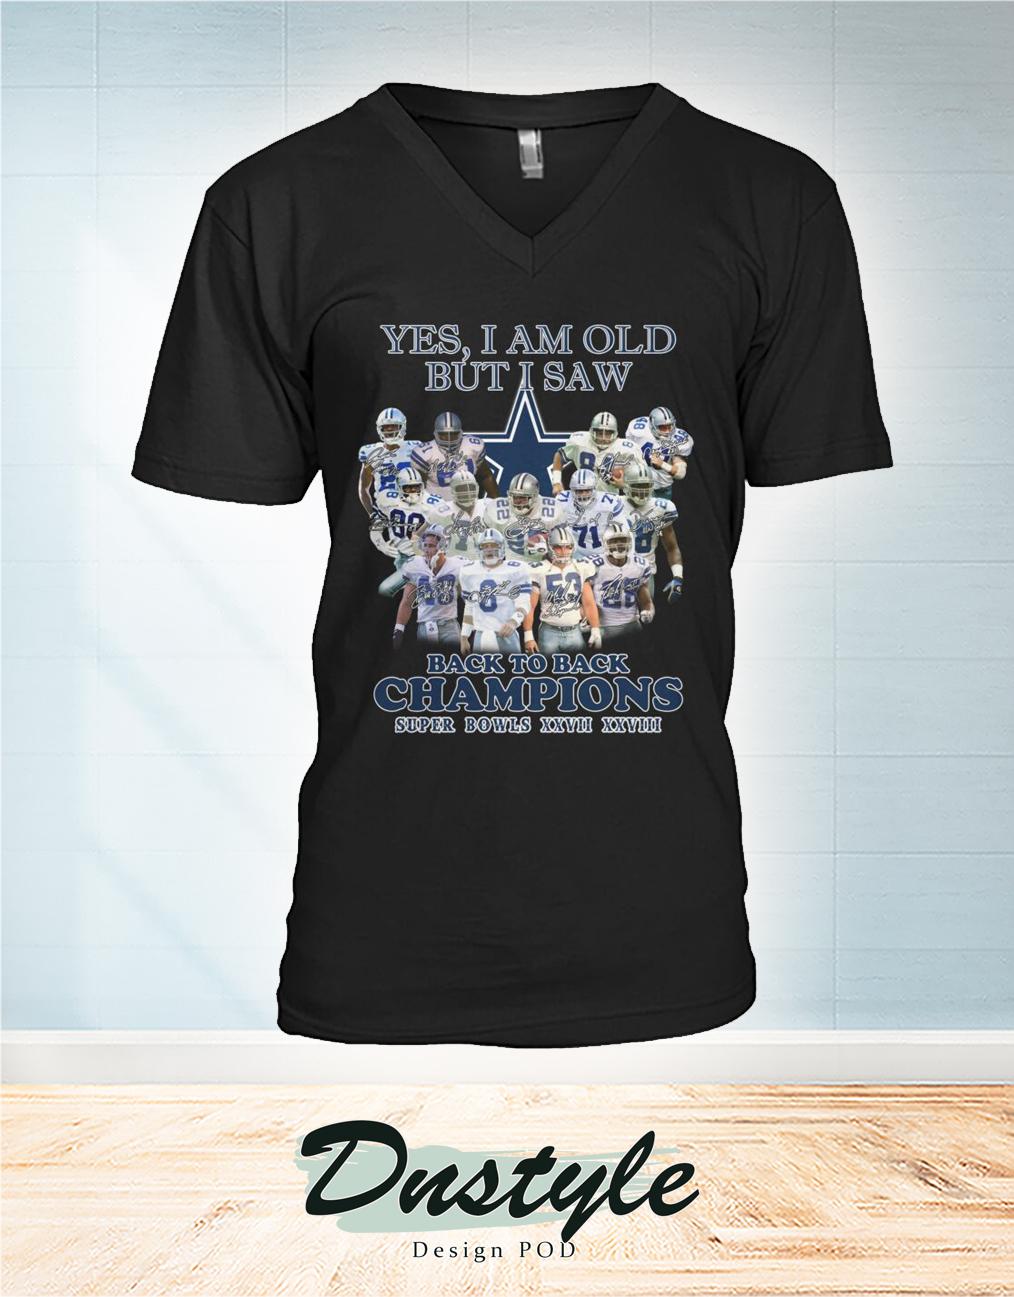 Dallas Cowboys yes I am old but I saw back to back Champions super bowls XXVII XXVIII v-neck